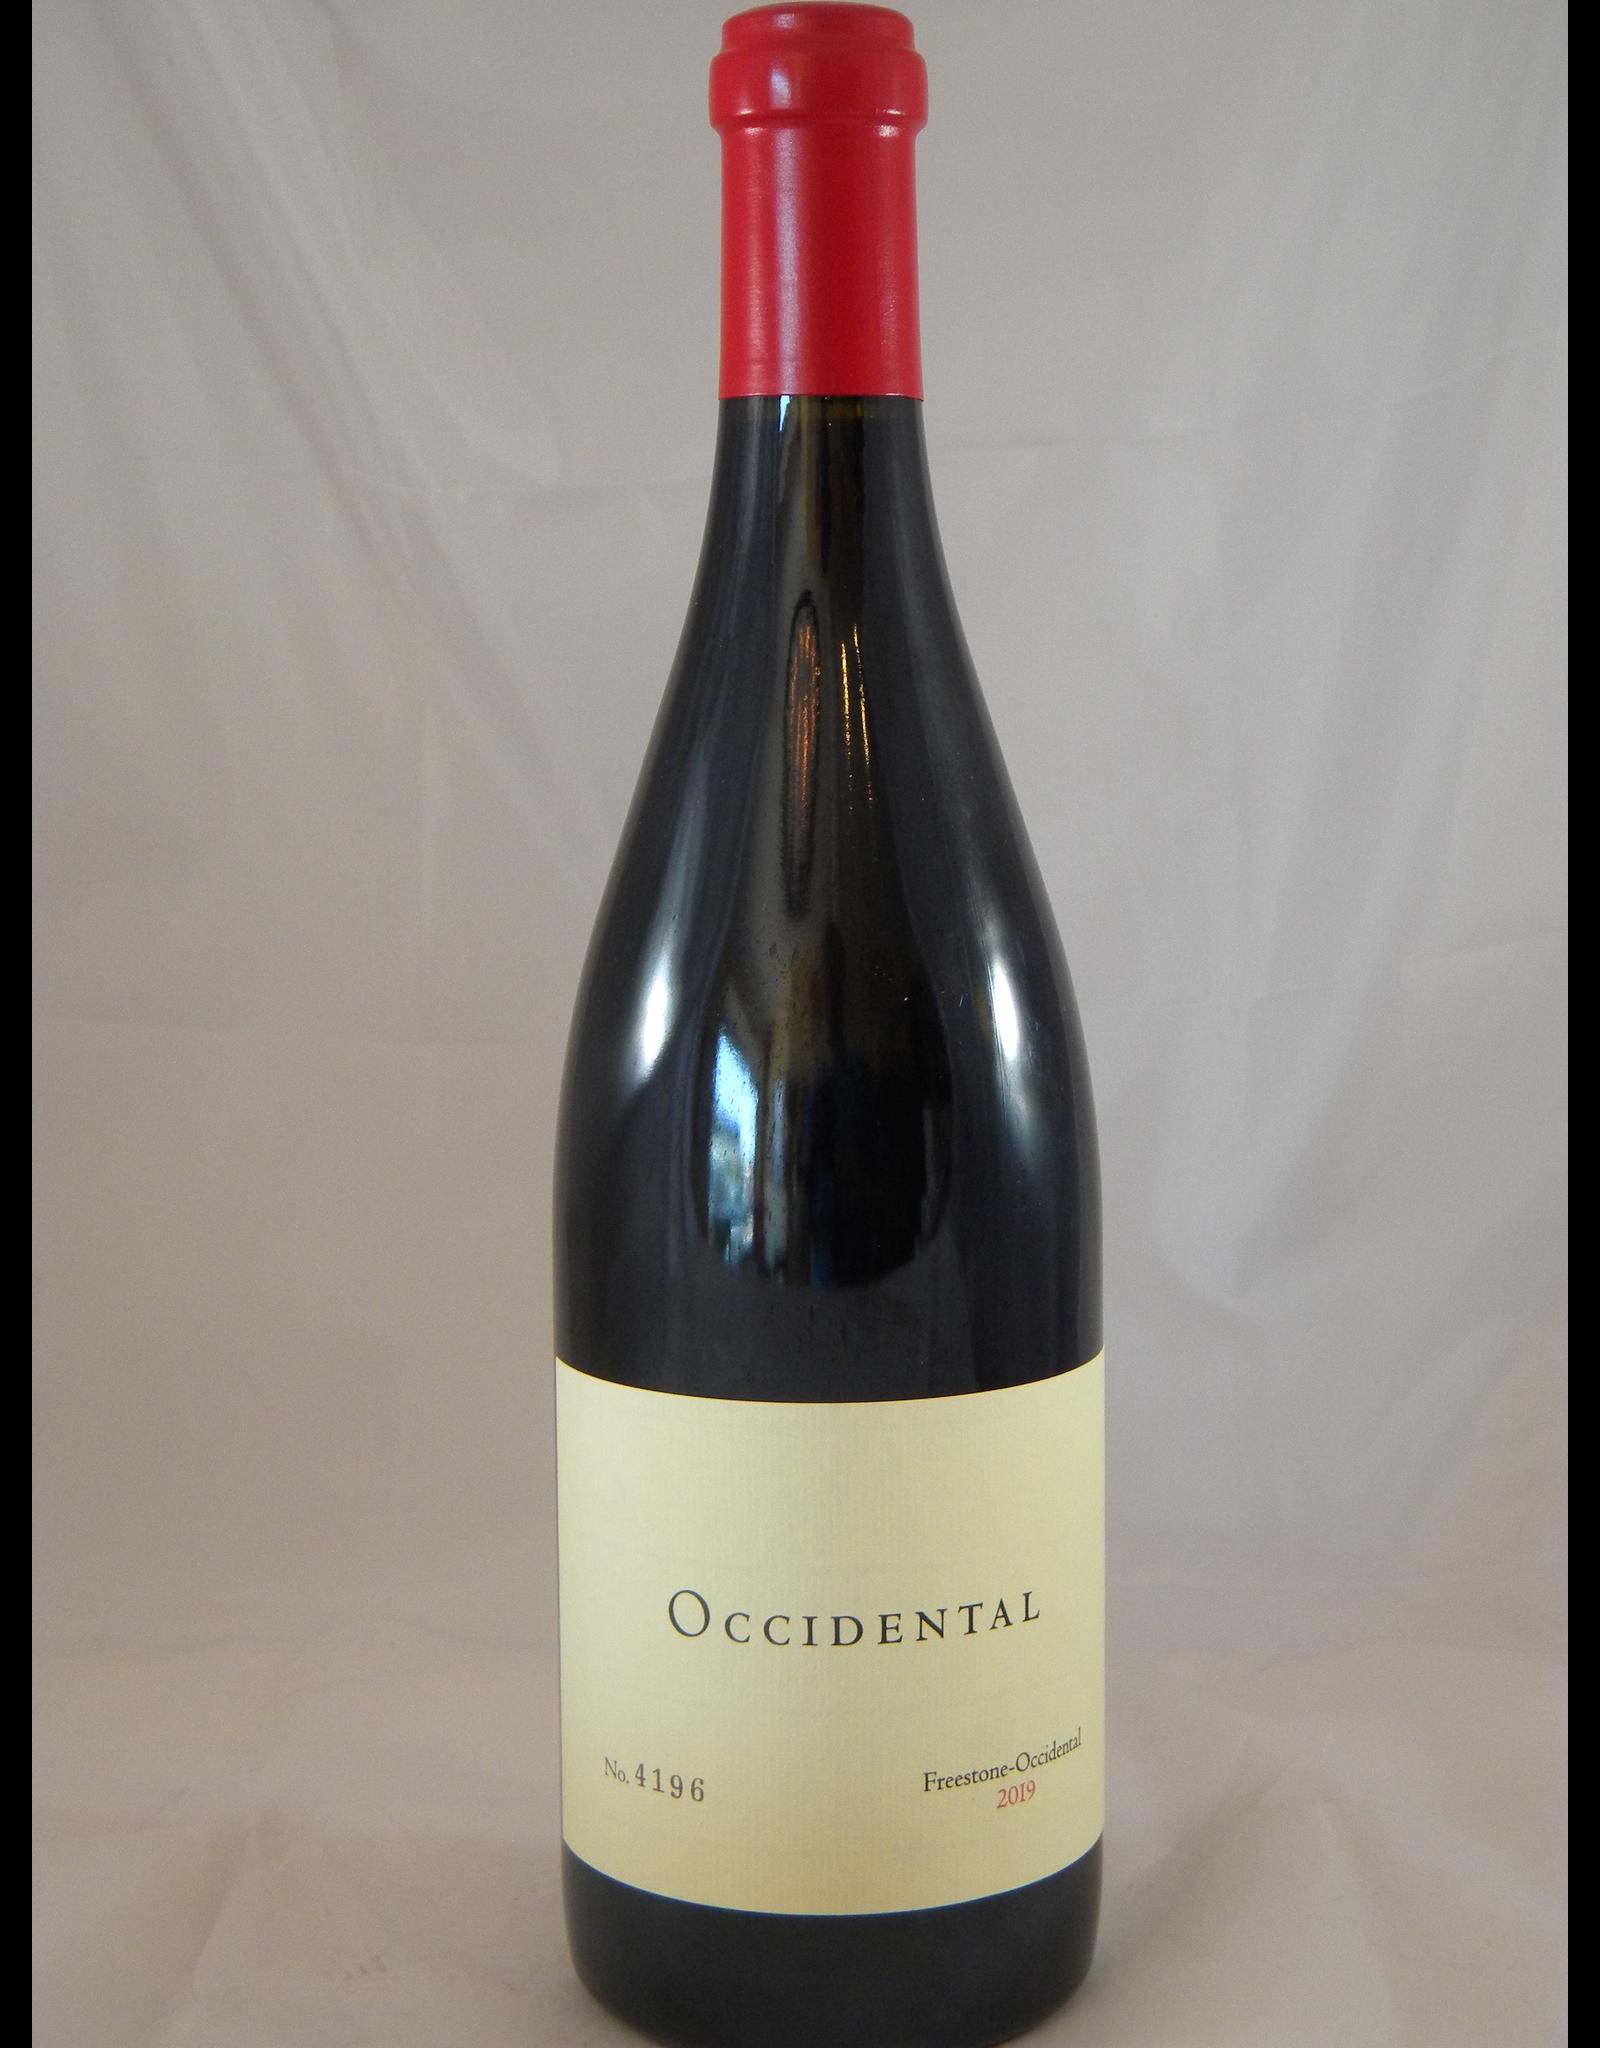 Occidental Pinot Noir Freestone Occidental 2019